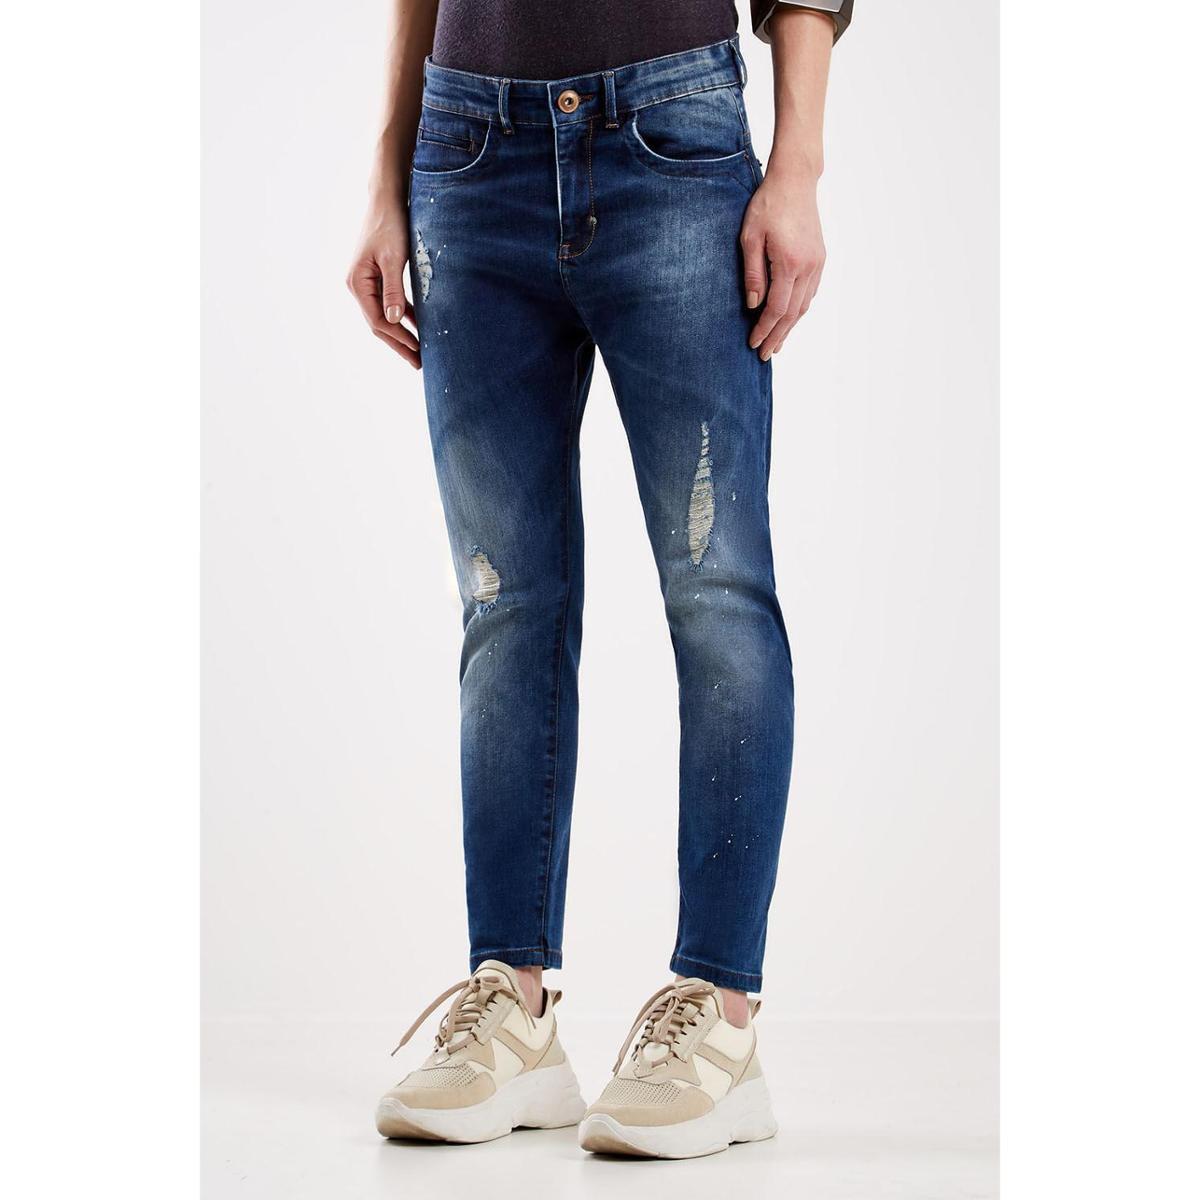 Calça Jeans Boy Dark Sacada Feminina - Azul